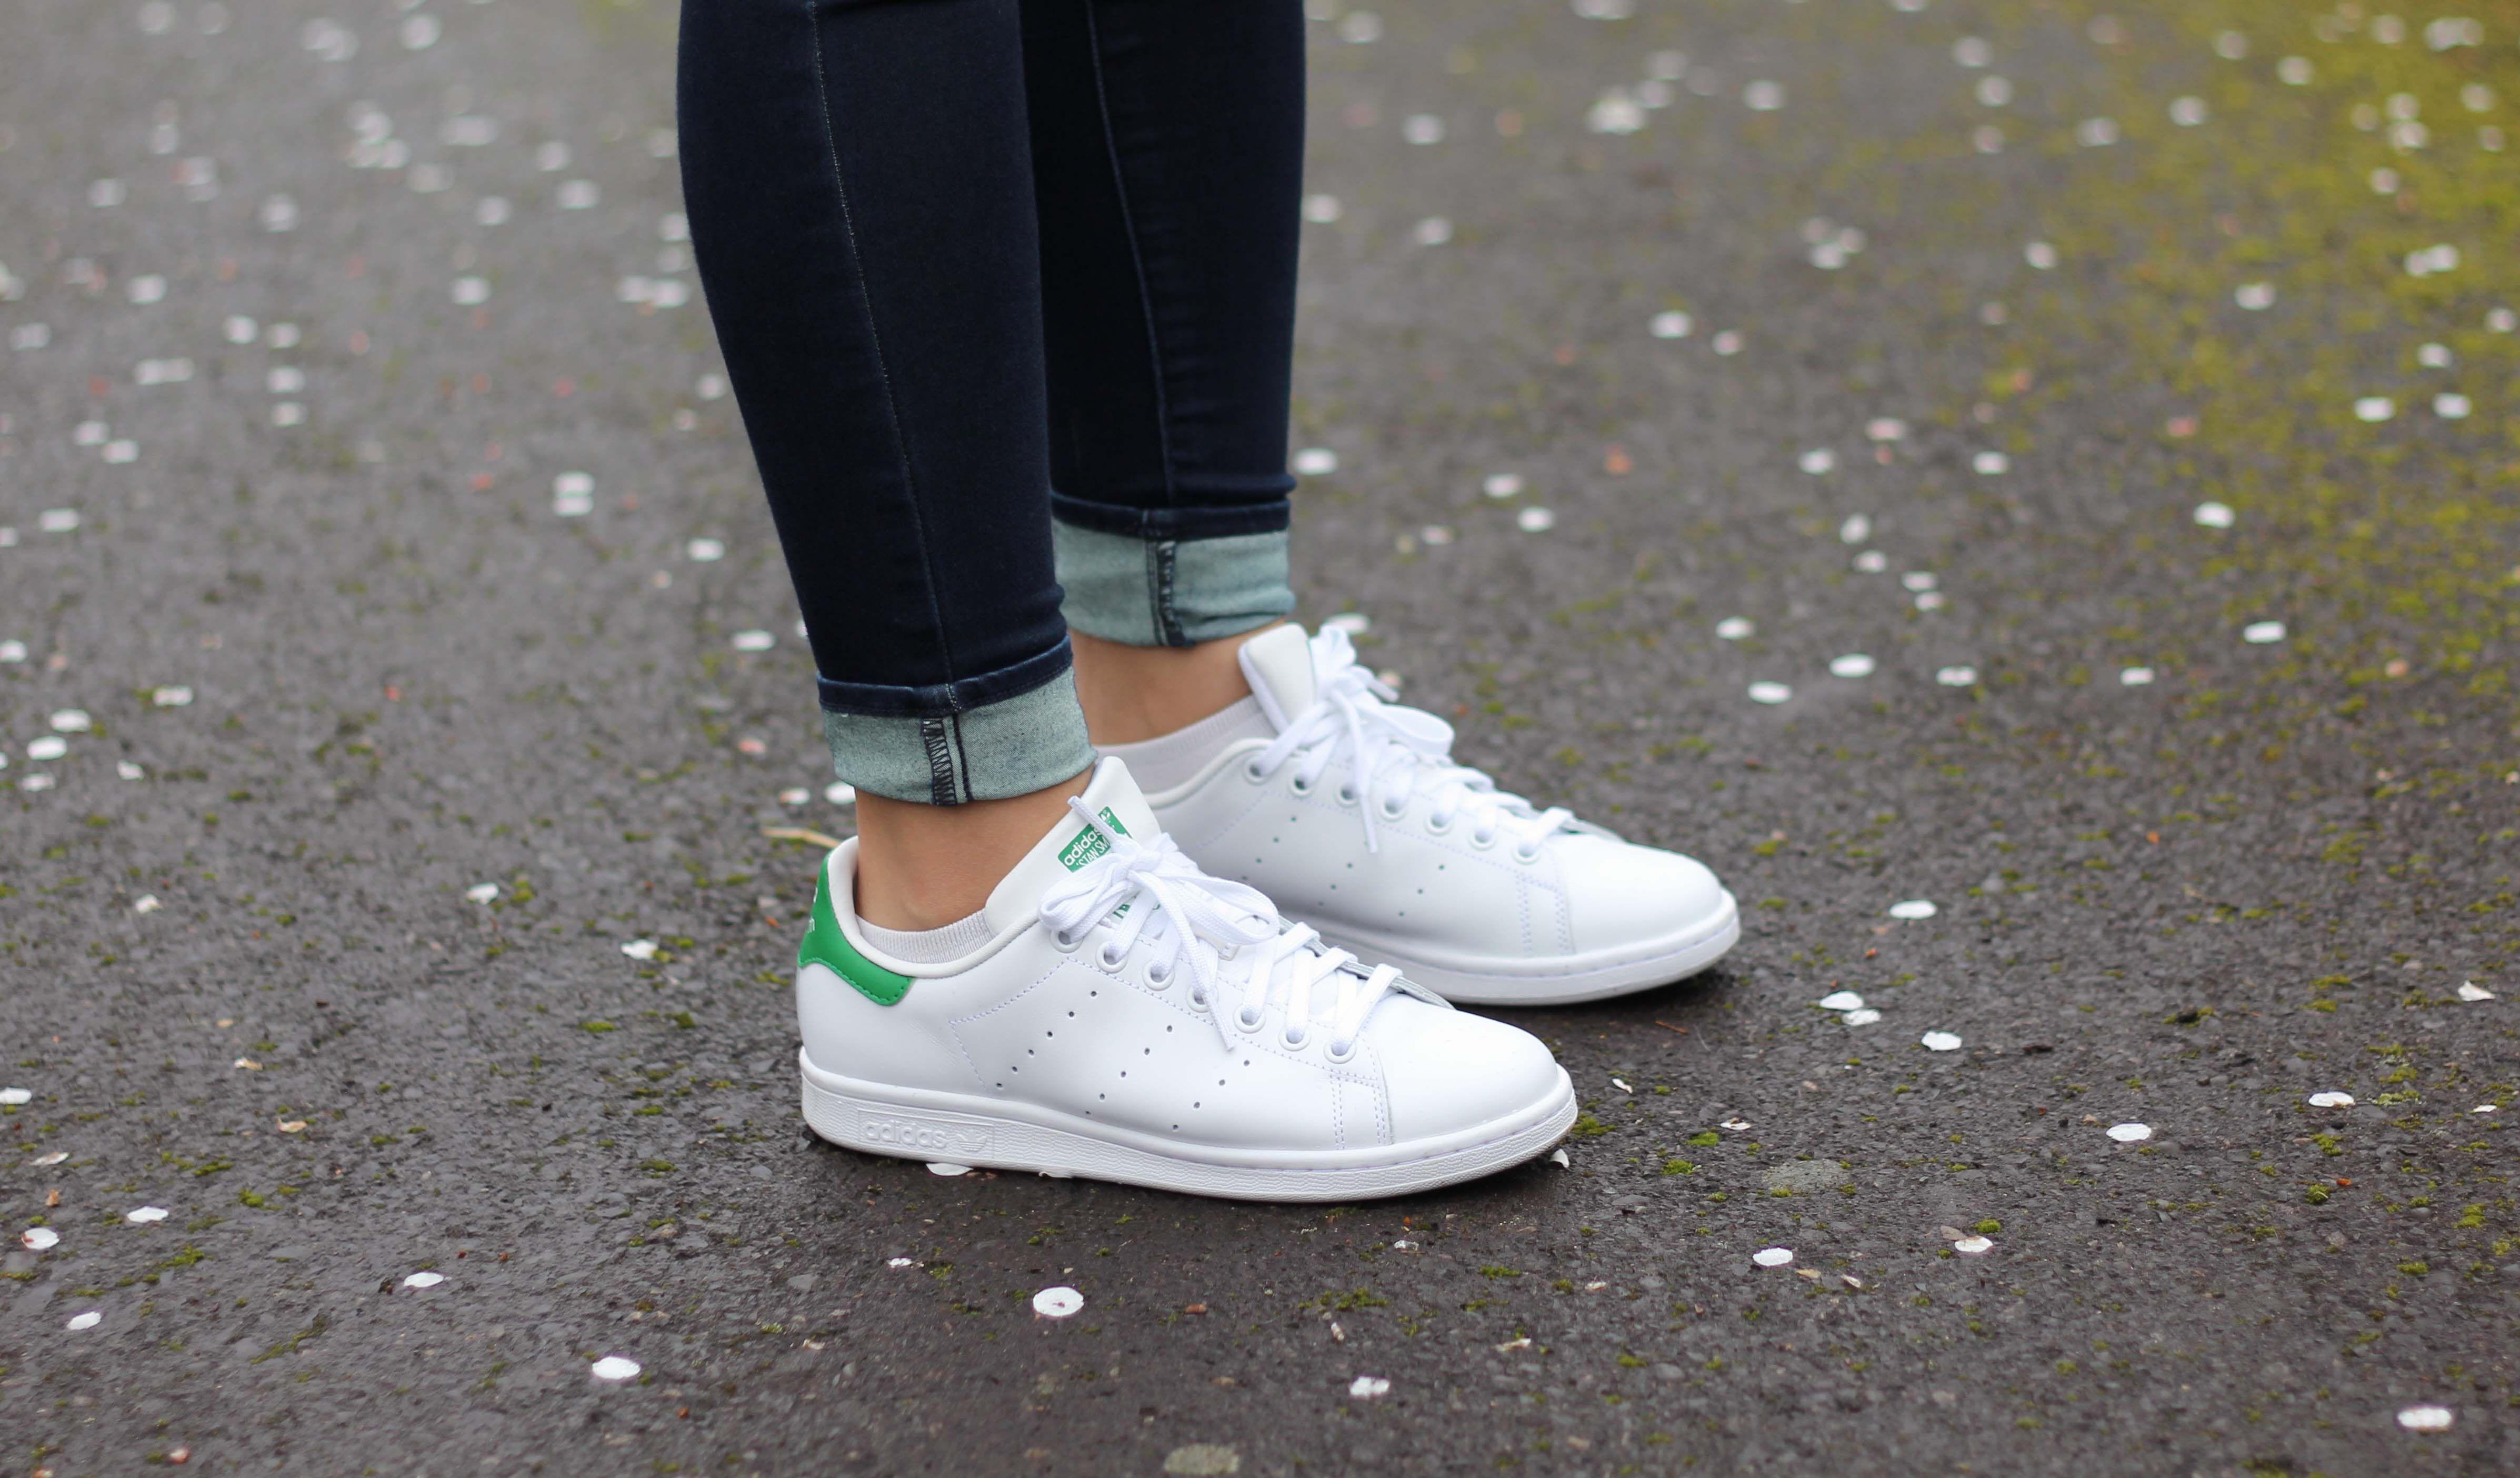 Ofensa milicia pollo  Adidas Stan Smiths for Women Review | Stan smith, Adidas stan smith,  Superstar outfit